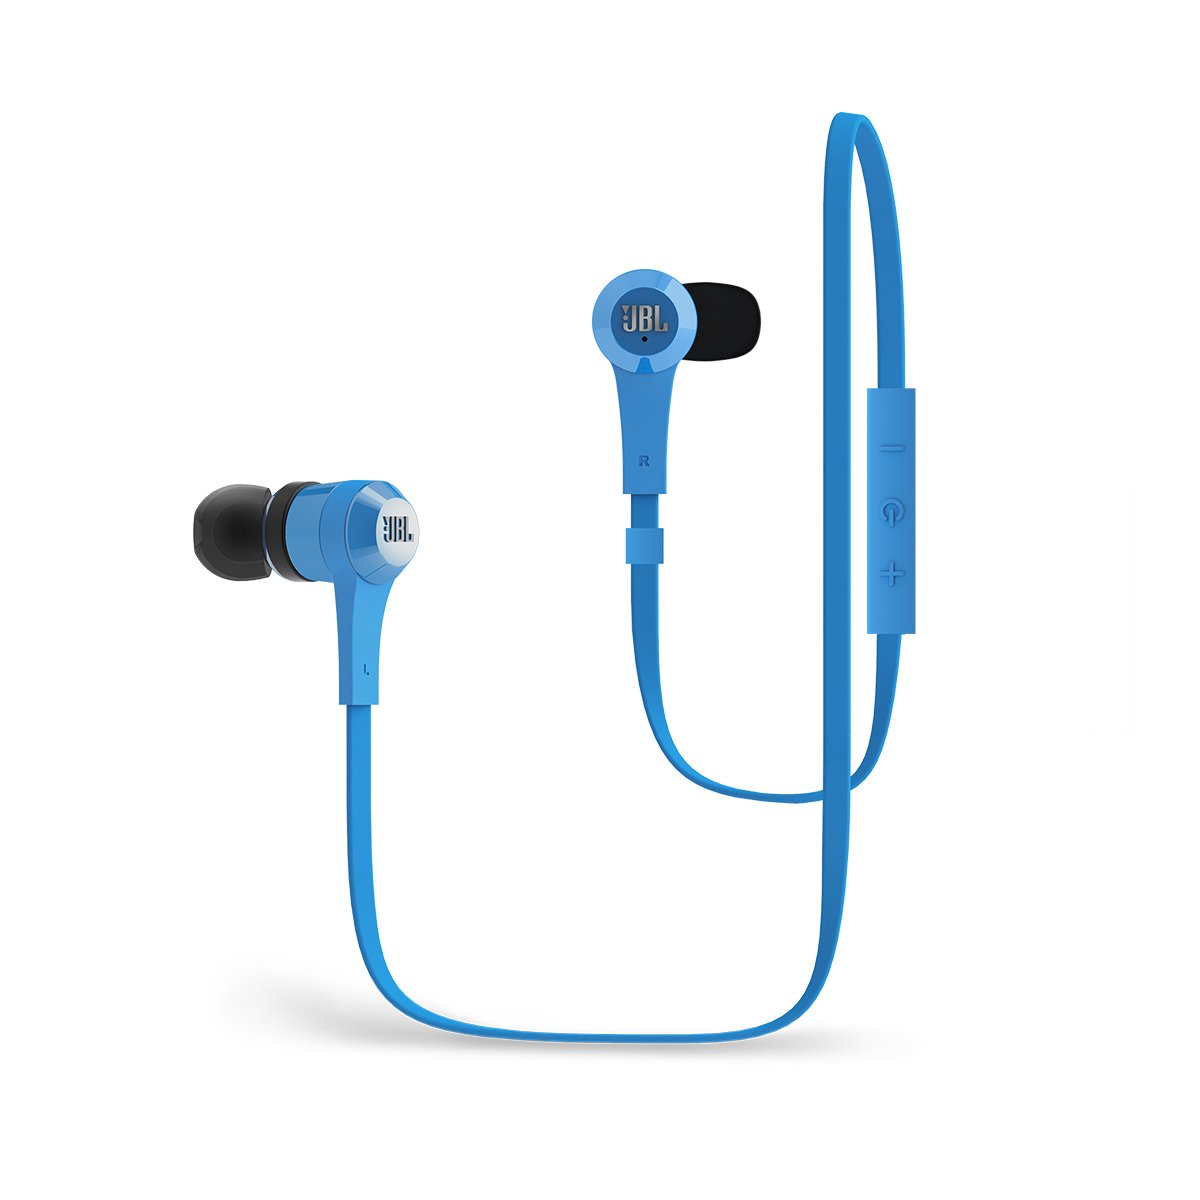 jbl headphones wireless price. amazon.com: jbl j46bt bluetooth wireless in-ear stereo headphone, blue: home audio \u0026 theater jbl headphones price